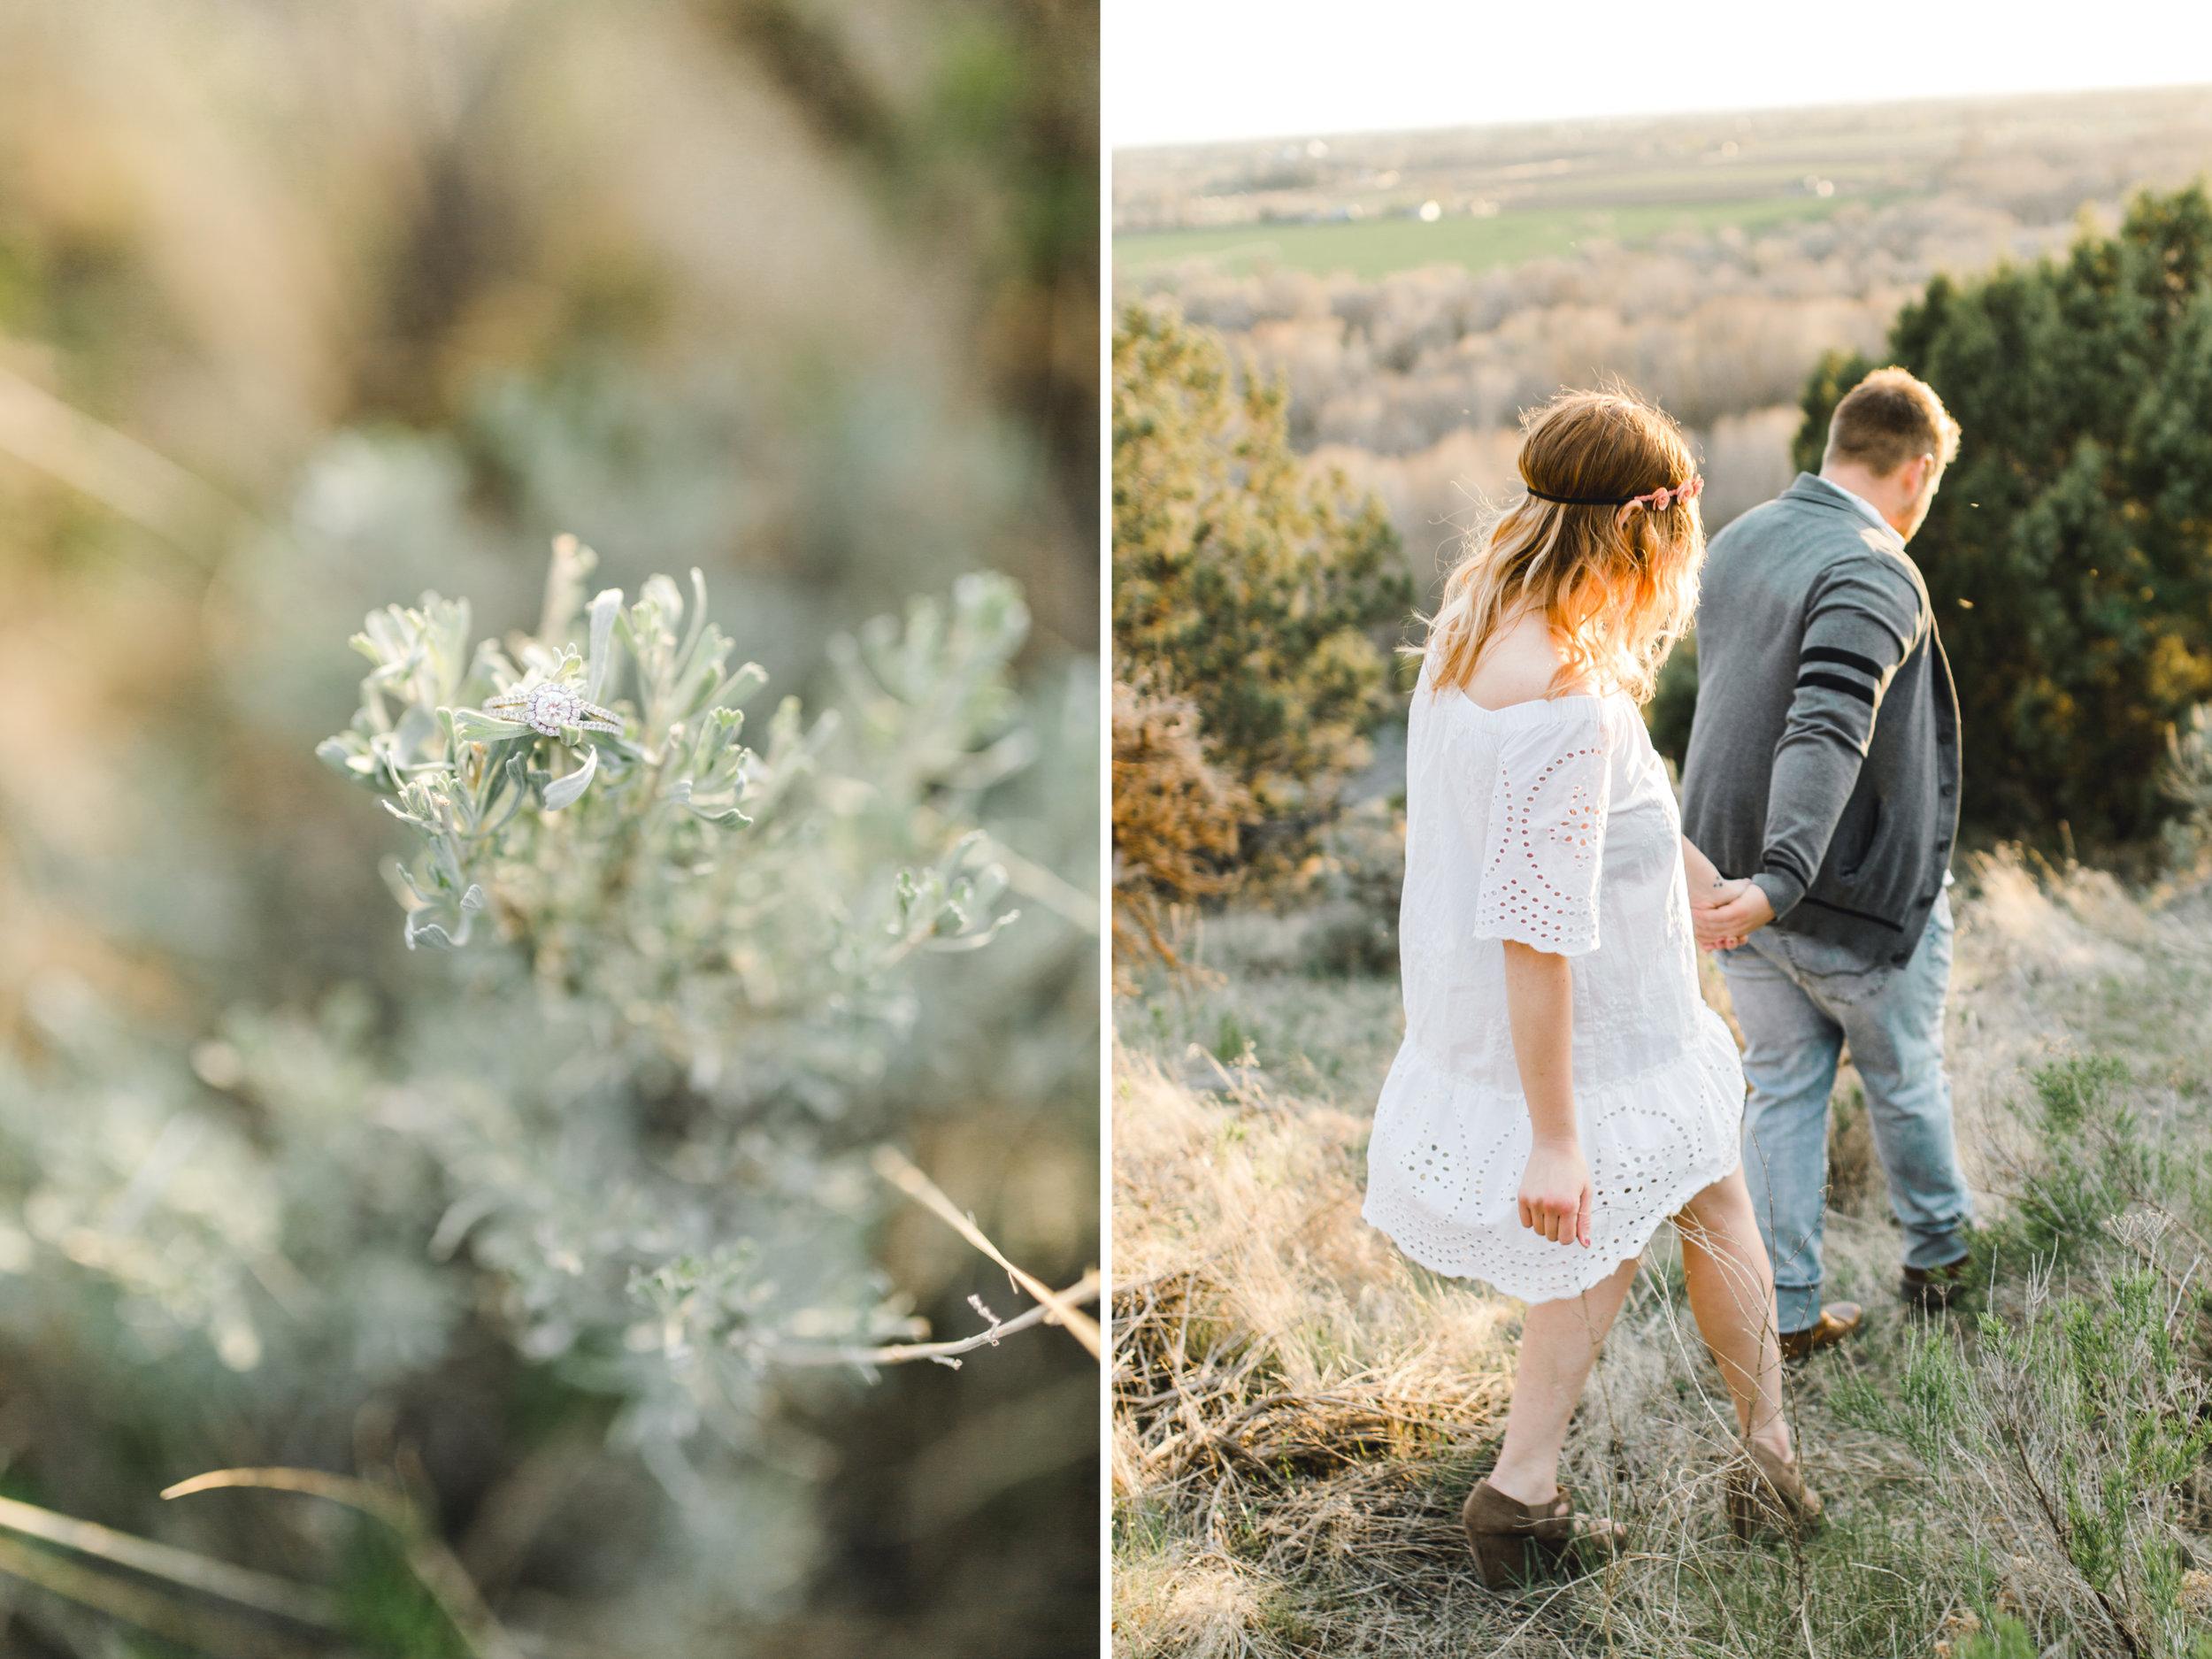 rexburg-idaho-engagement-photographer-cress-creek-nature-trail-anna-christine-photo-devin-kalene-8.jpg